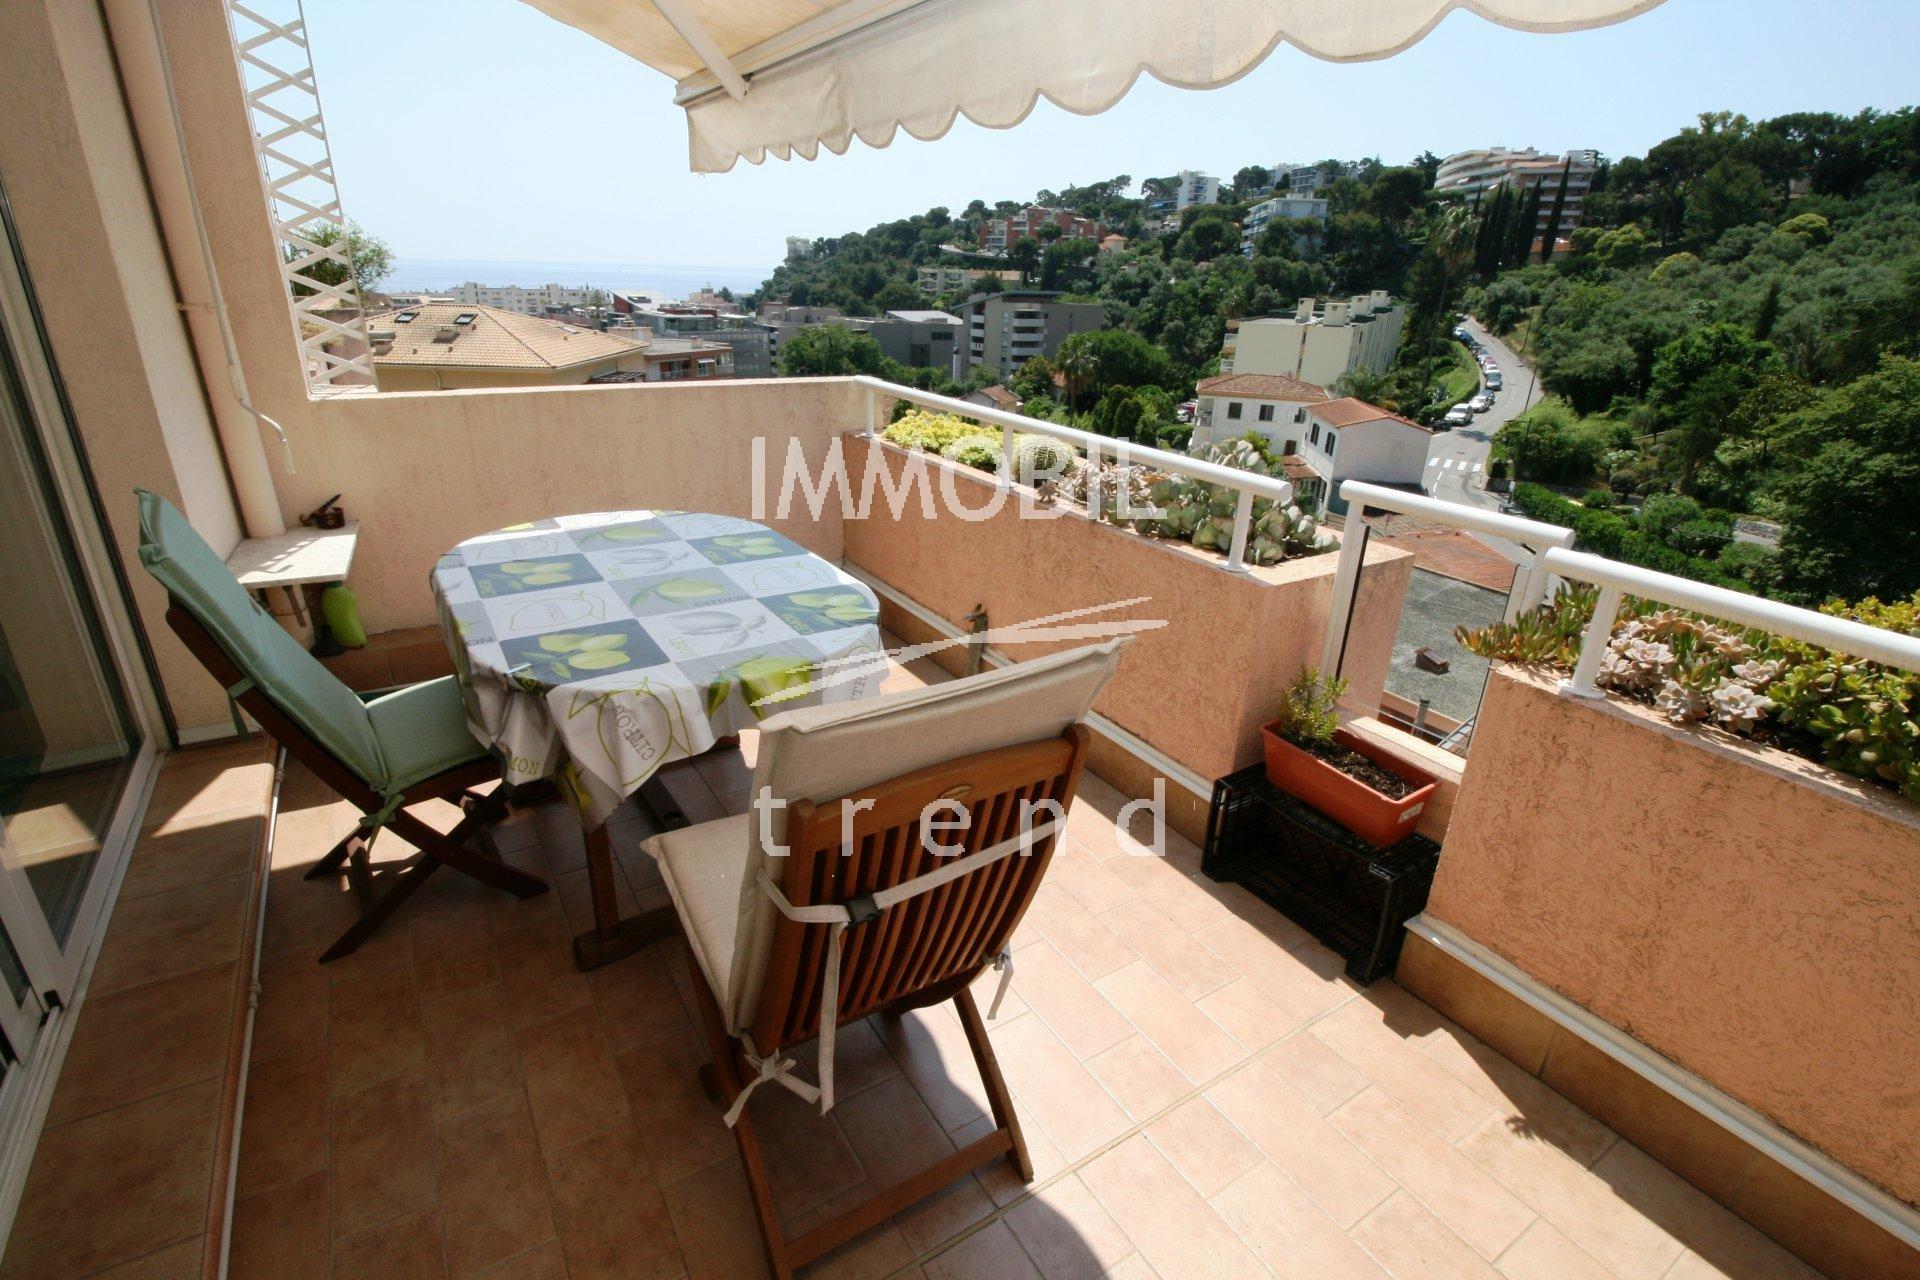 Immobilier Roquebrune Cap Martin 2 pieces avec vue mer